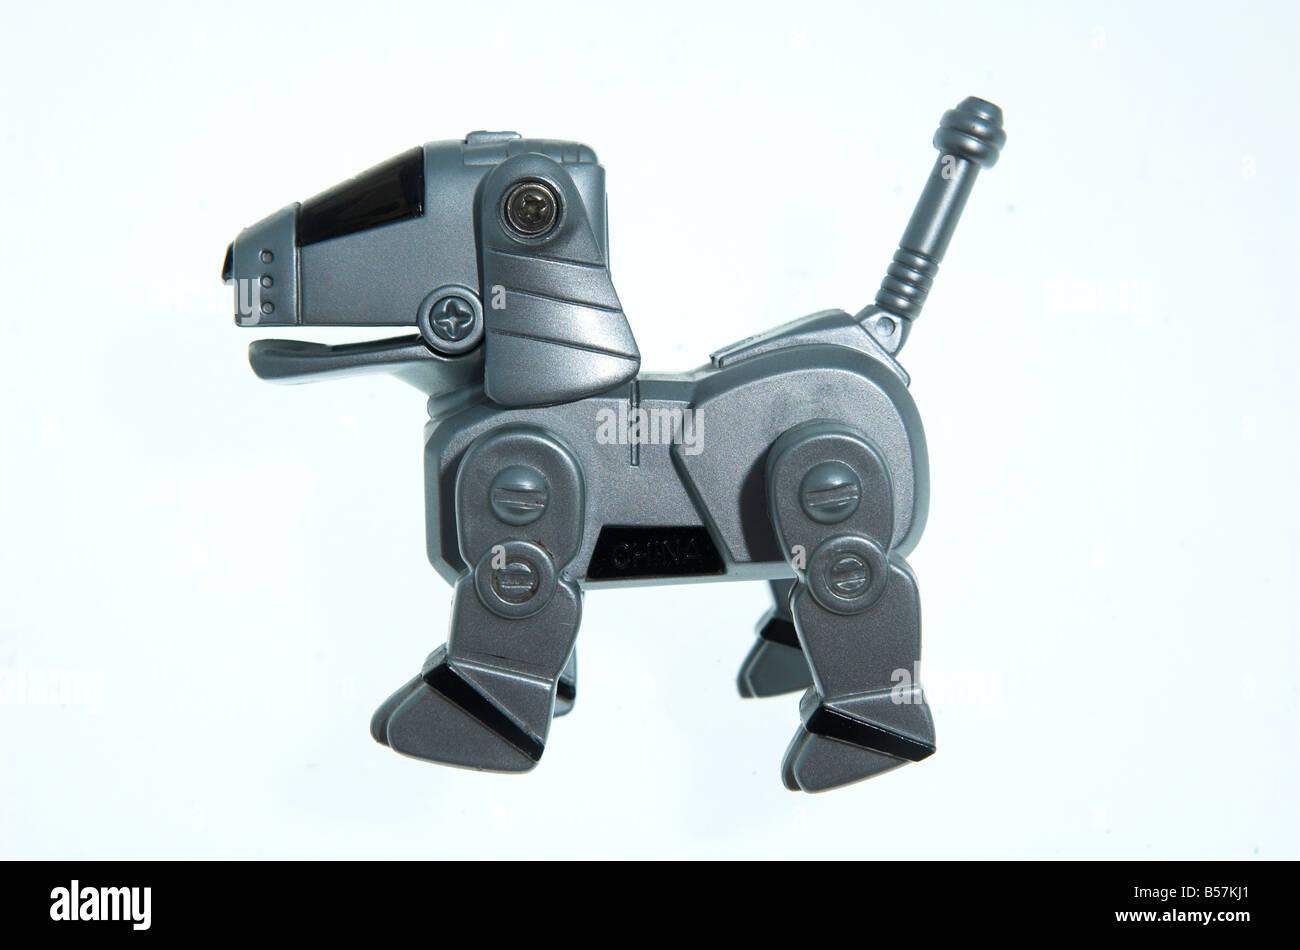 Robotic Dog Toy Stock Photos Robotic Dog Toy Stock Images Alamy